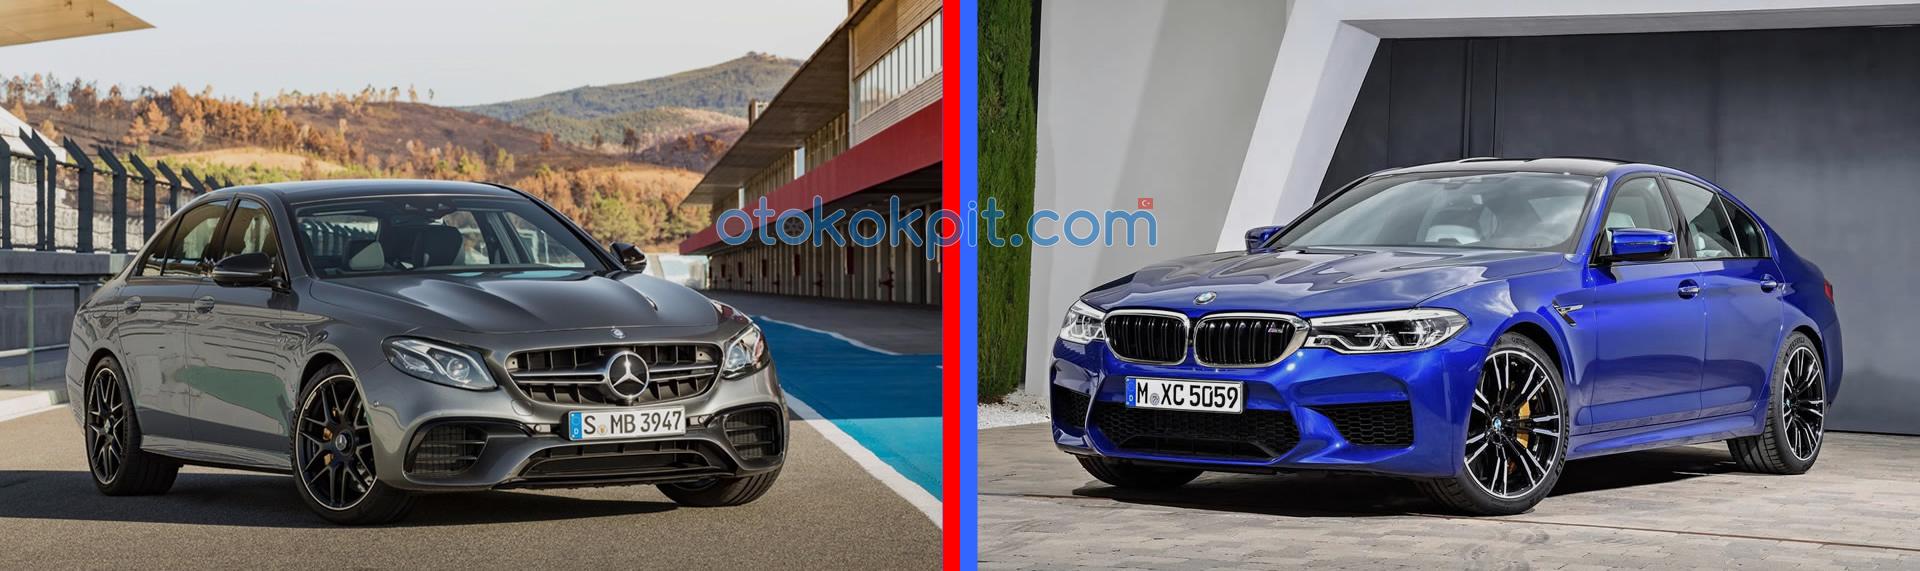 2018 Yeni Kasa BMW M5 (F90) - Mercedes-AMG E63 S Karşılaştırması